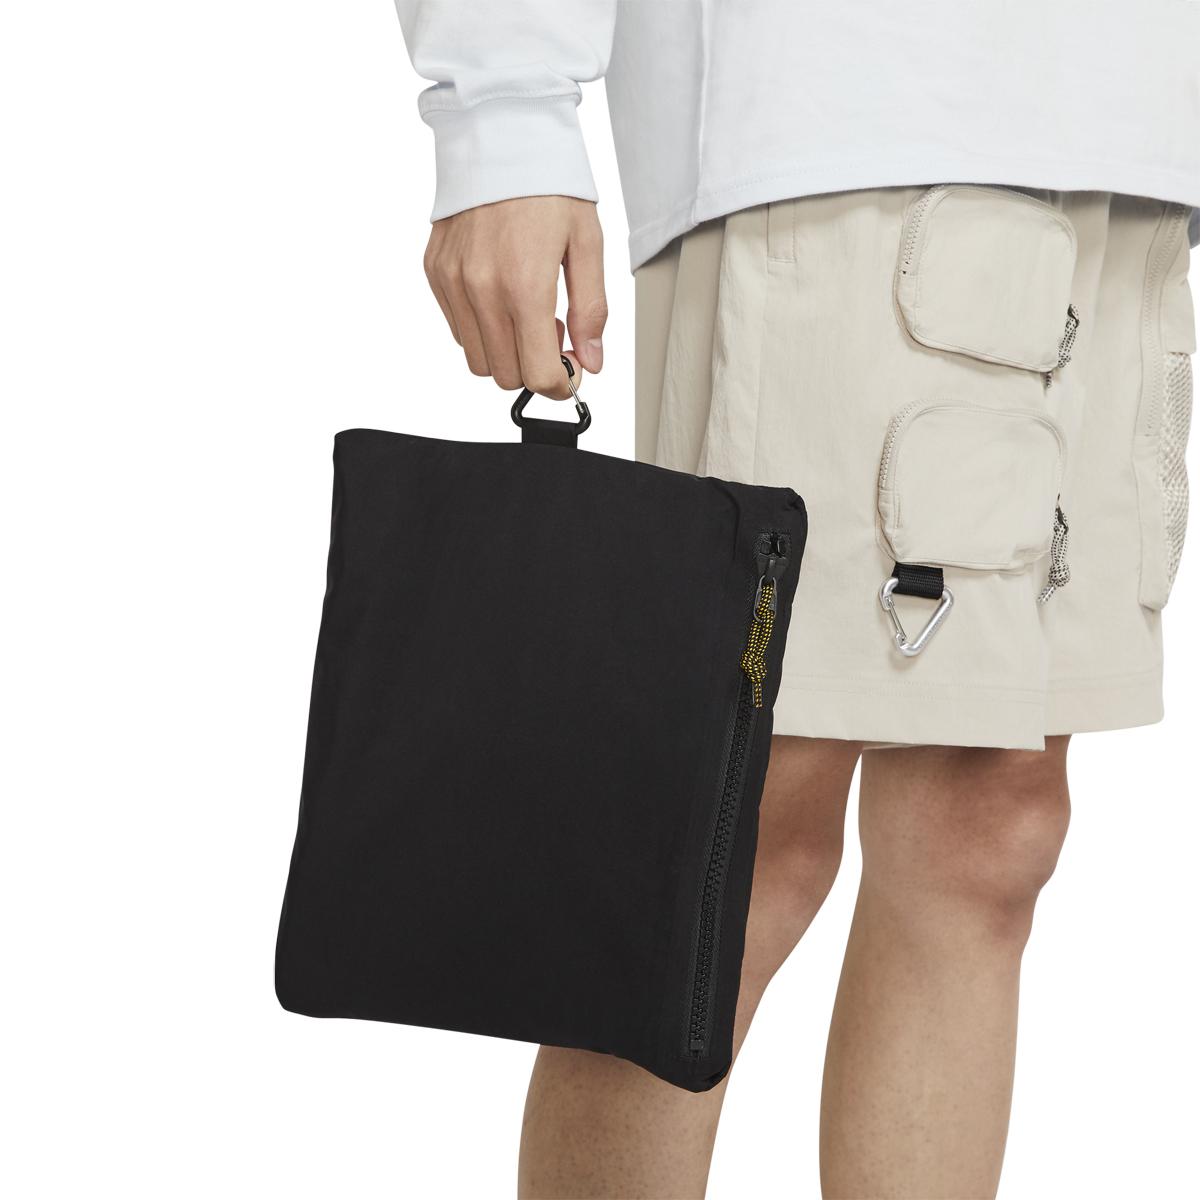 Nike NRG ACT GORE-TEX Paclite Jacket